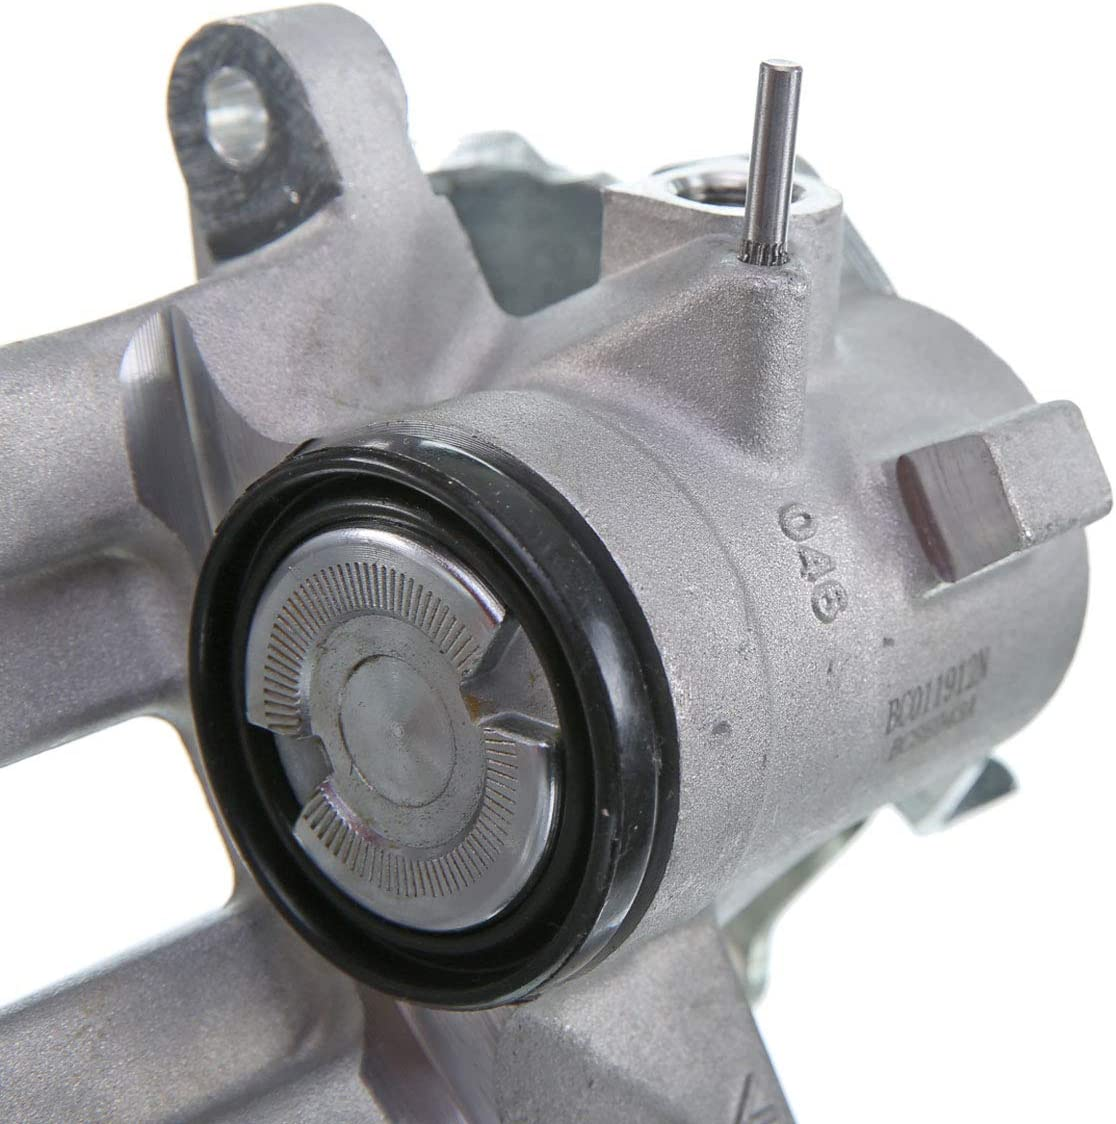 Rear Right Disc Brake Caliper Assembly for Audi A6 Quattro 1998-2004 Allroad Quattro 2001-2005 Volkswagen Passat 2000-2005